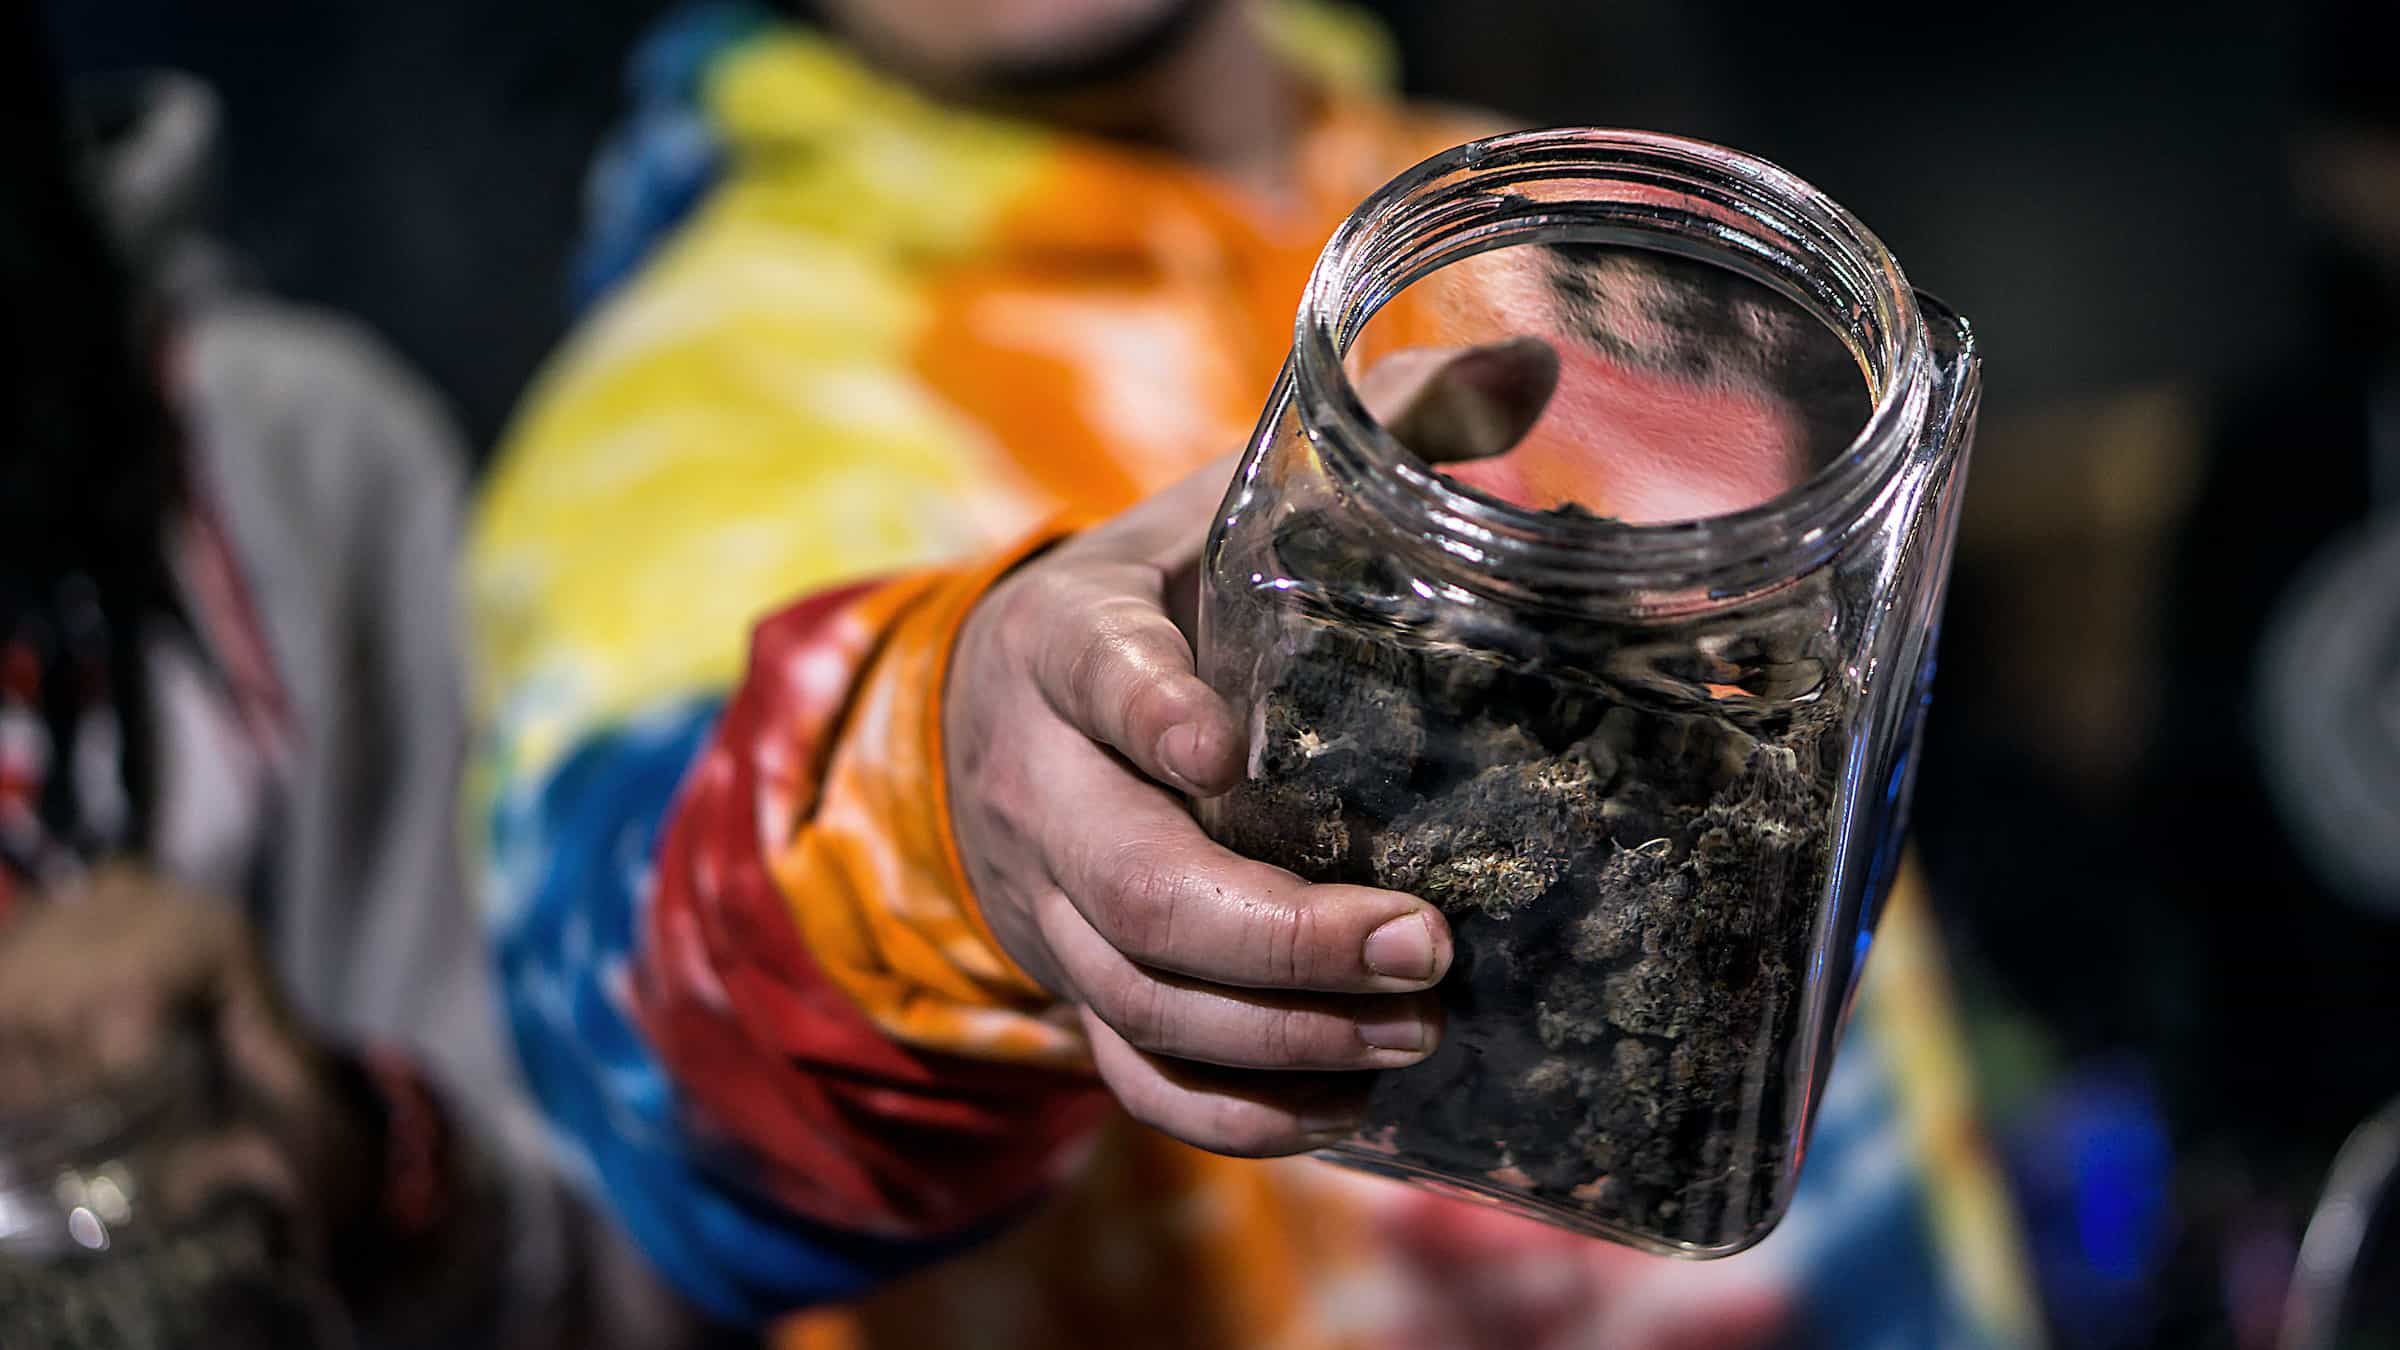 Budtender holding a glass jar of cannabis buds.